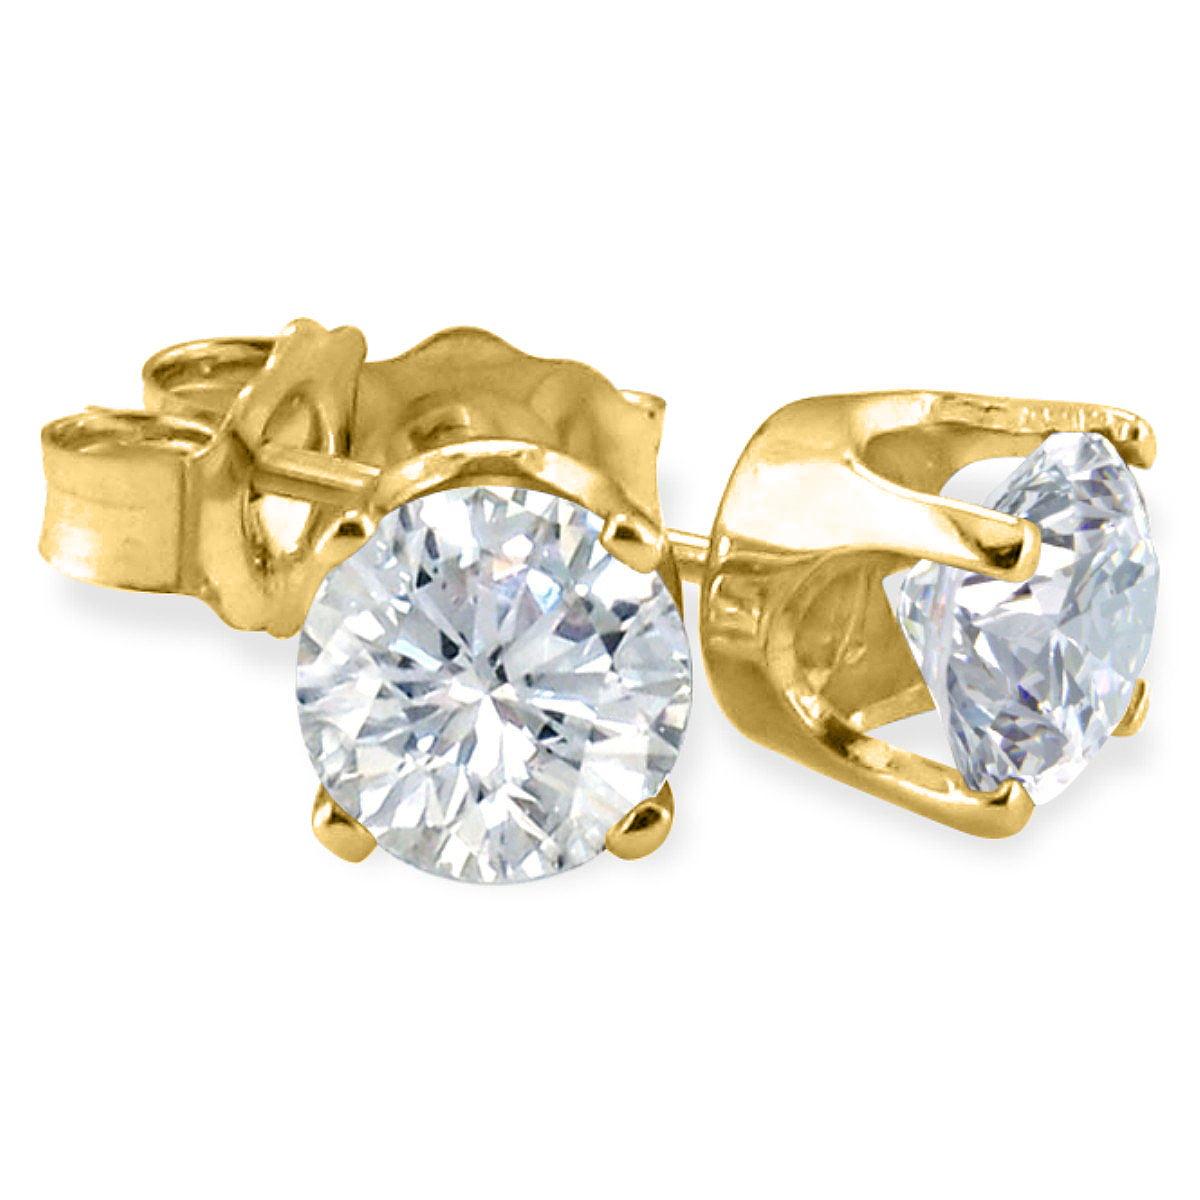 SuperJeweler 14k Yellow Gold, Round, Diamond Stud Earrings